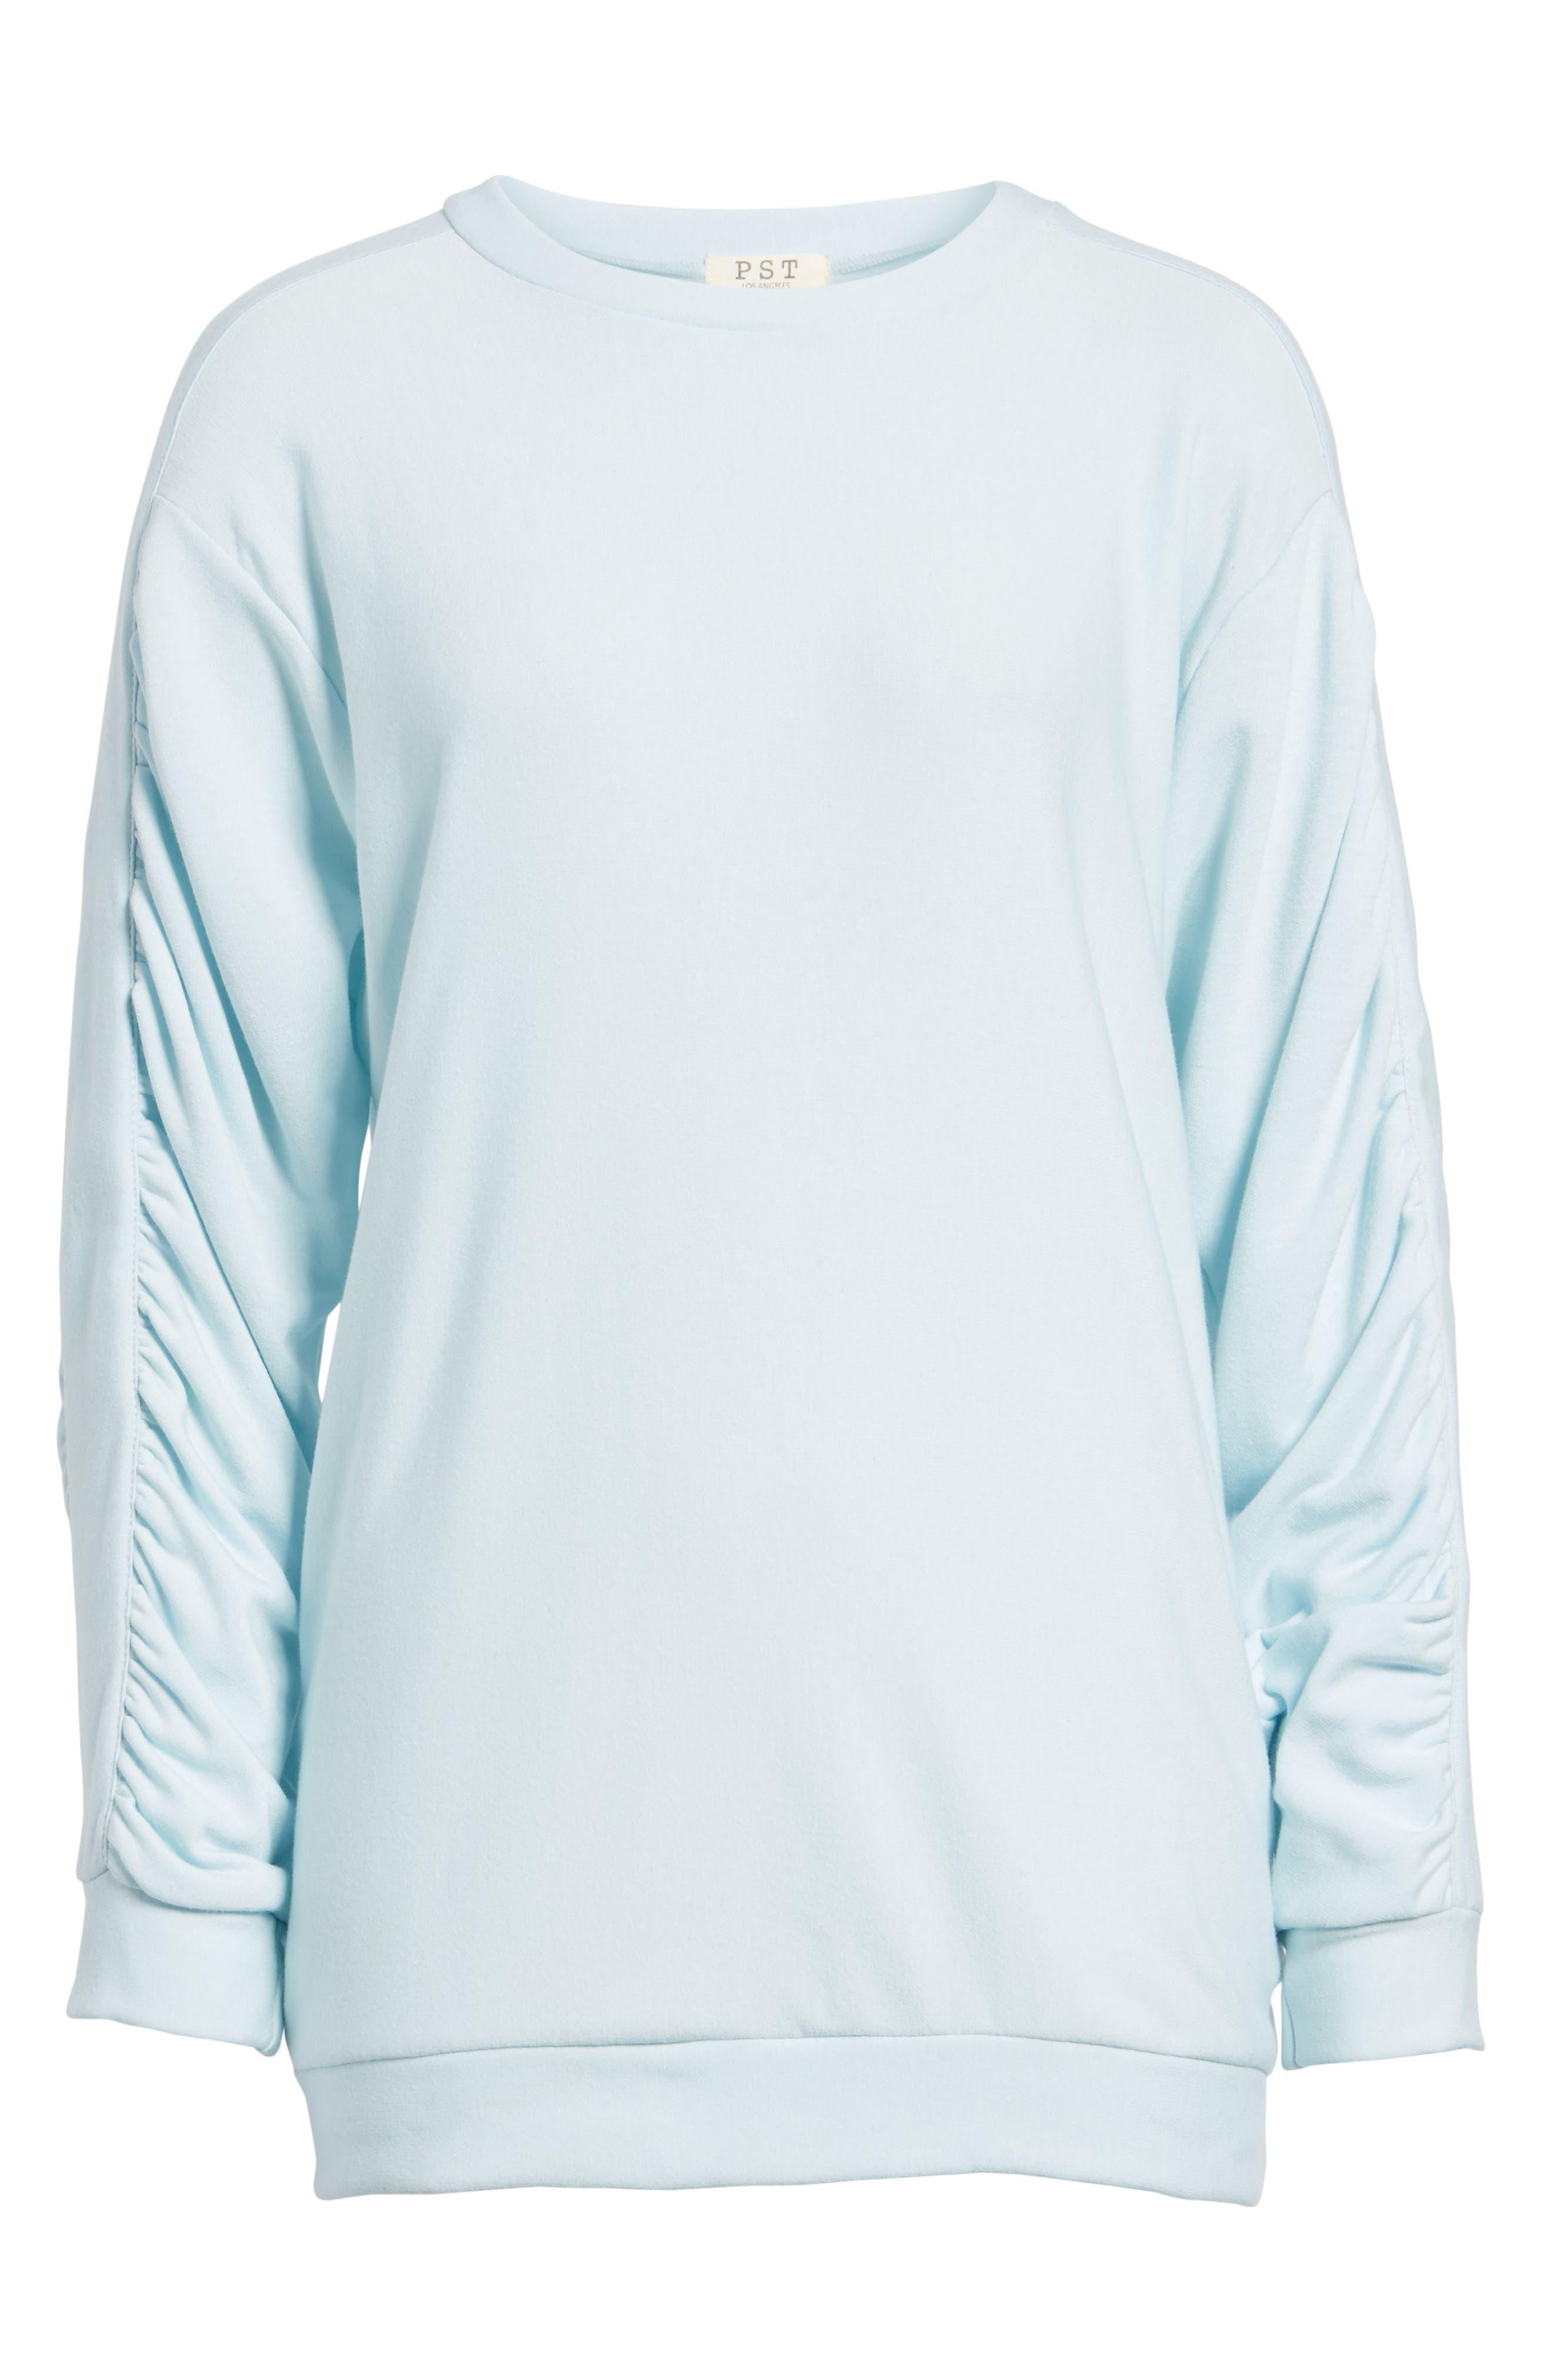 Ruched Sleeve Sweatshirt,                             Alternate thumbnail 6, color,                             Light Blue